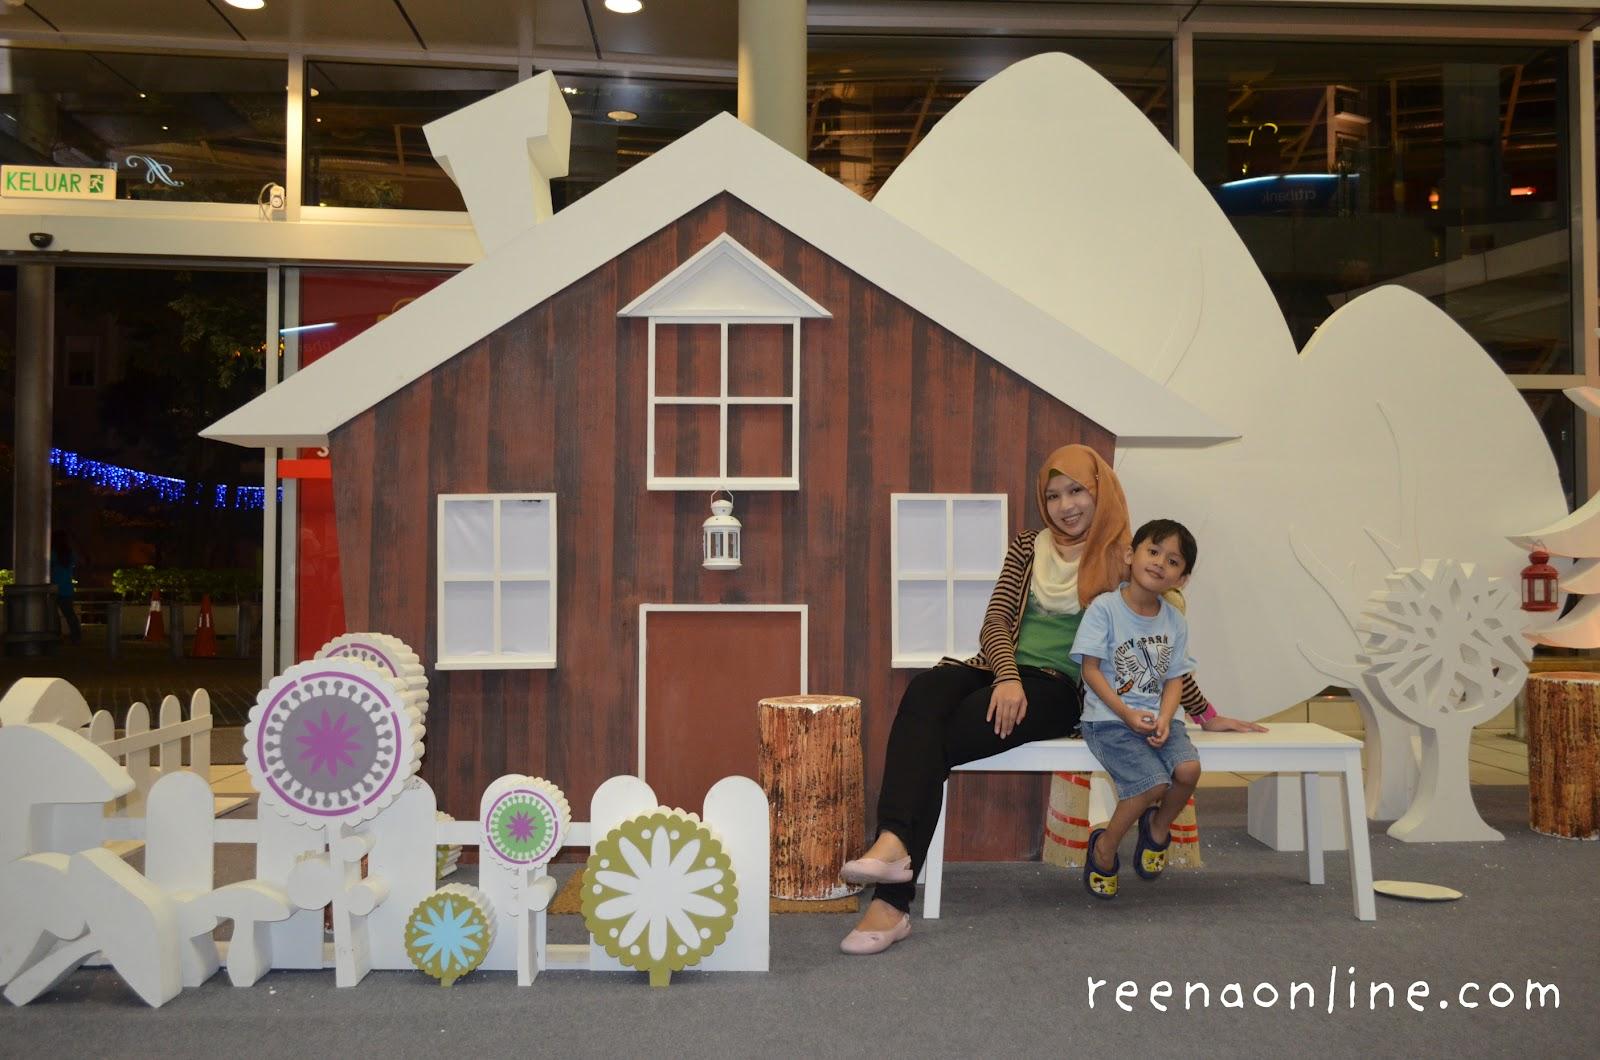 Reena's Online: Hiasan Shopping Complex / Pusat Membeli-Belah